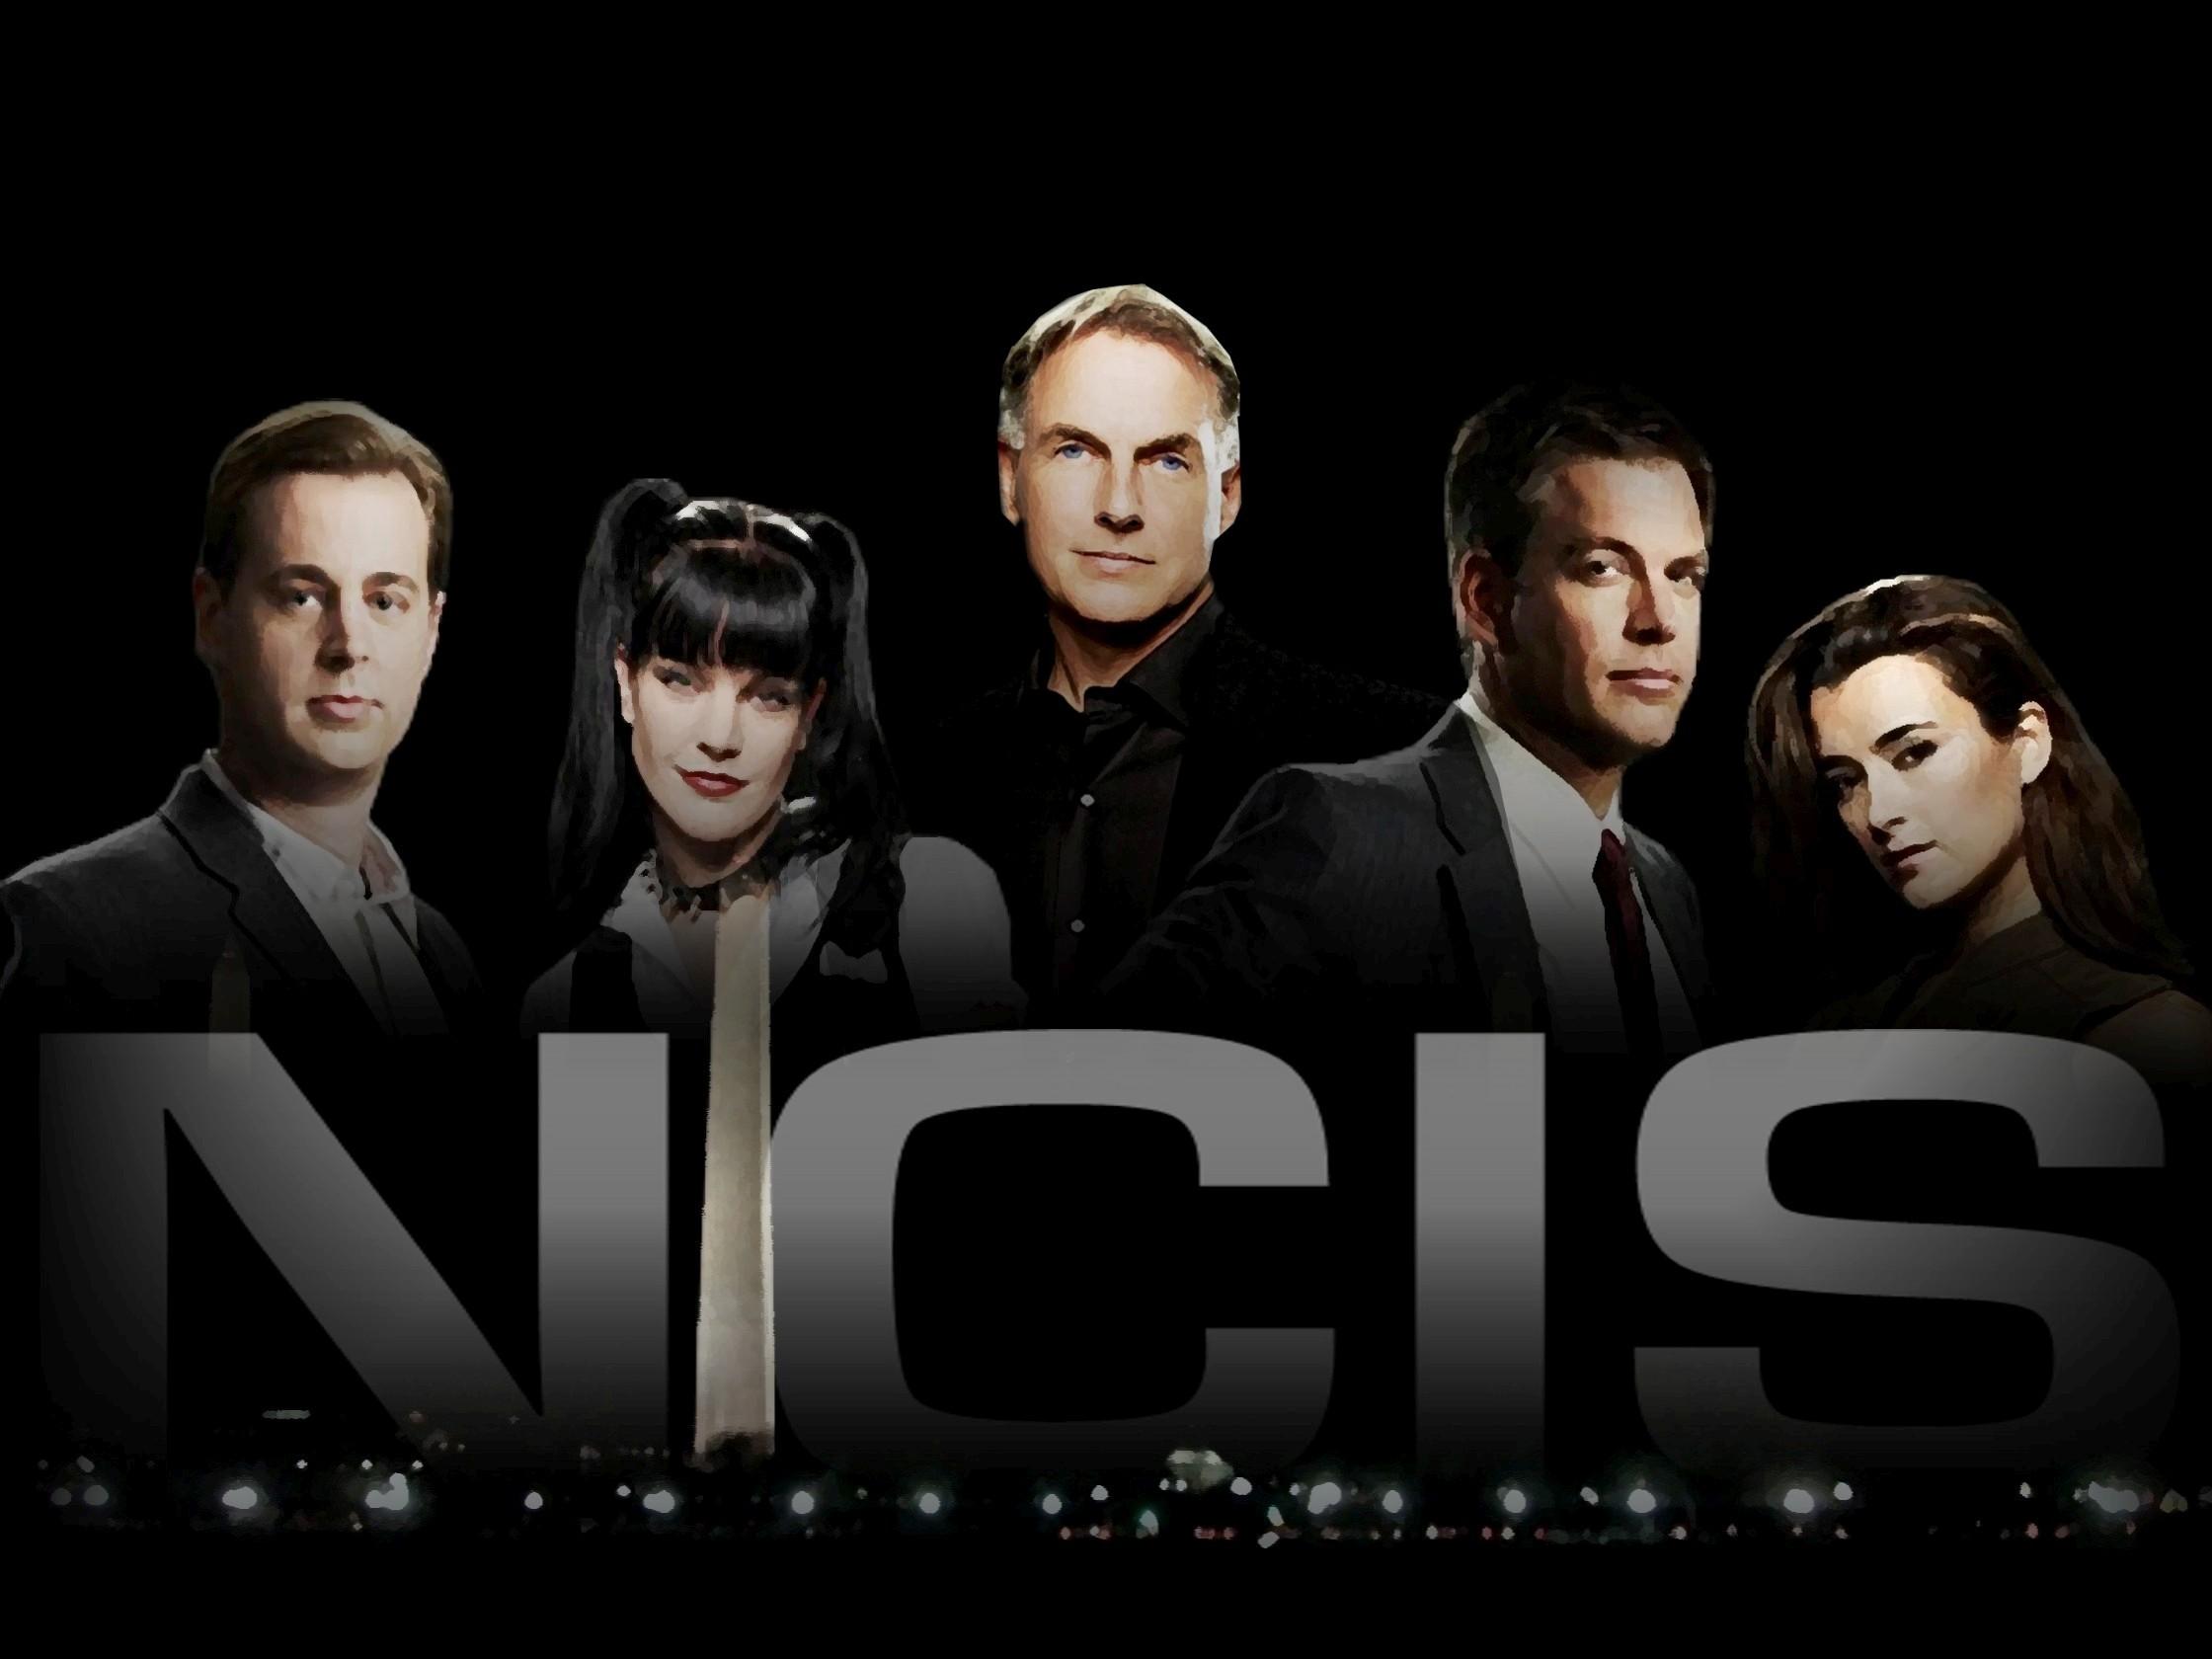 NCIS NCIS 2240x1680